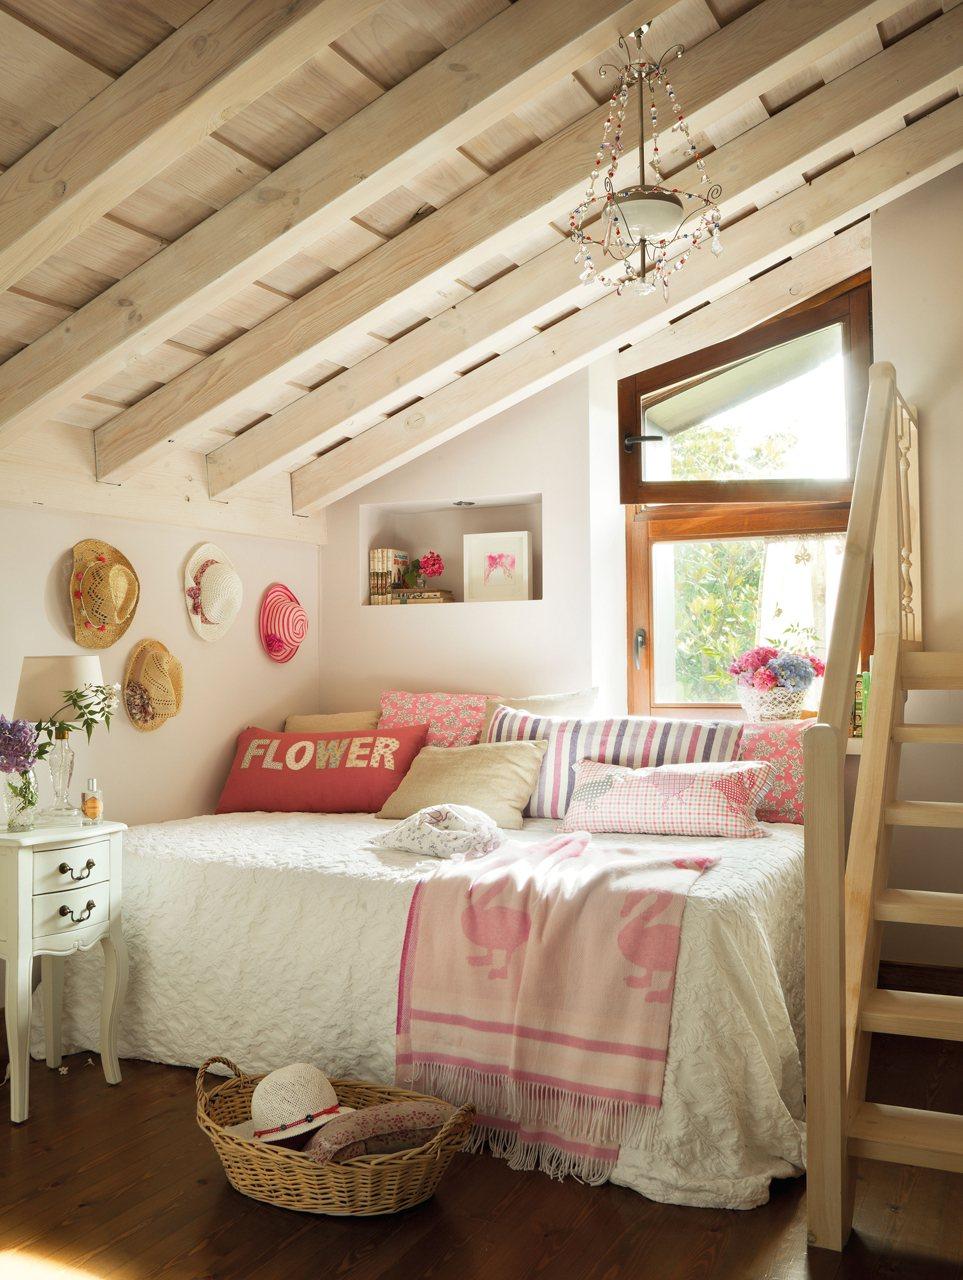 15 dormitorio en la buhardilla 963x1280 - Buhardillas Con Encanto